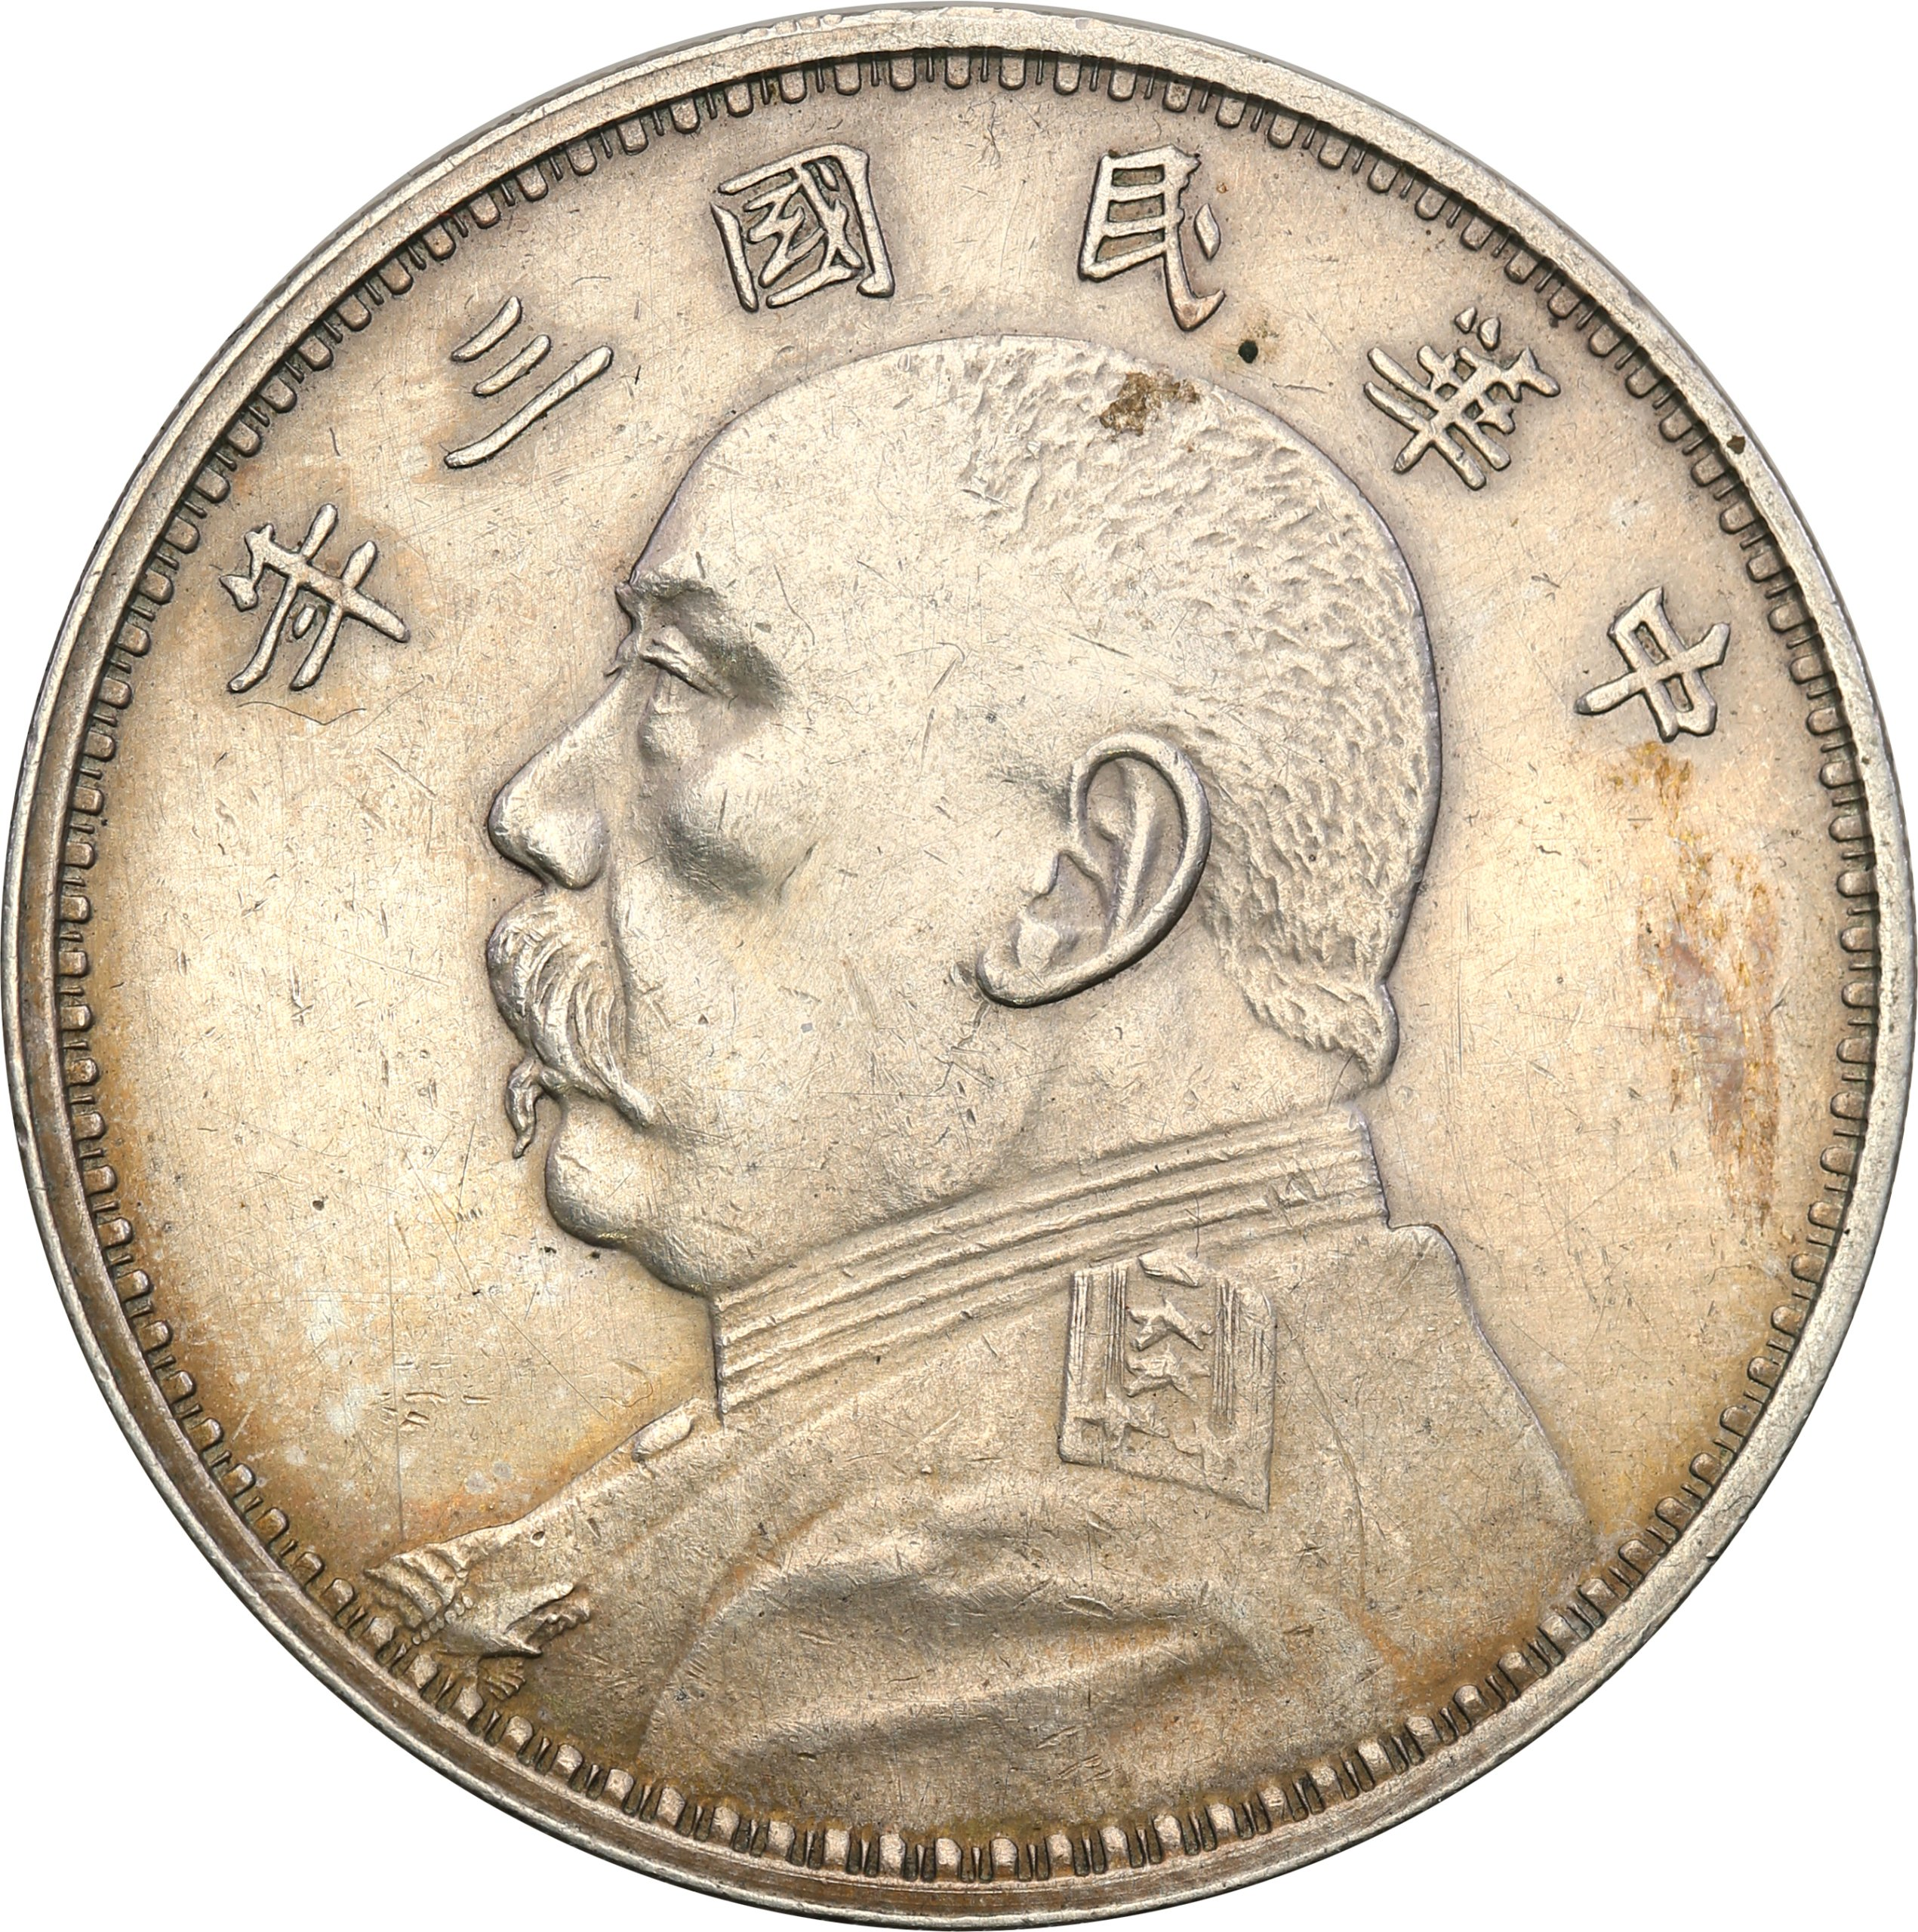 Chiny Republika 1 Yuan (dolar) b.d. (1914) st. 3